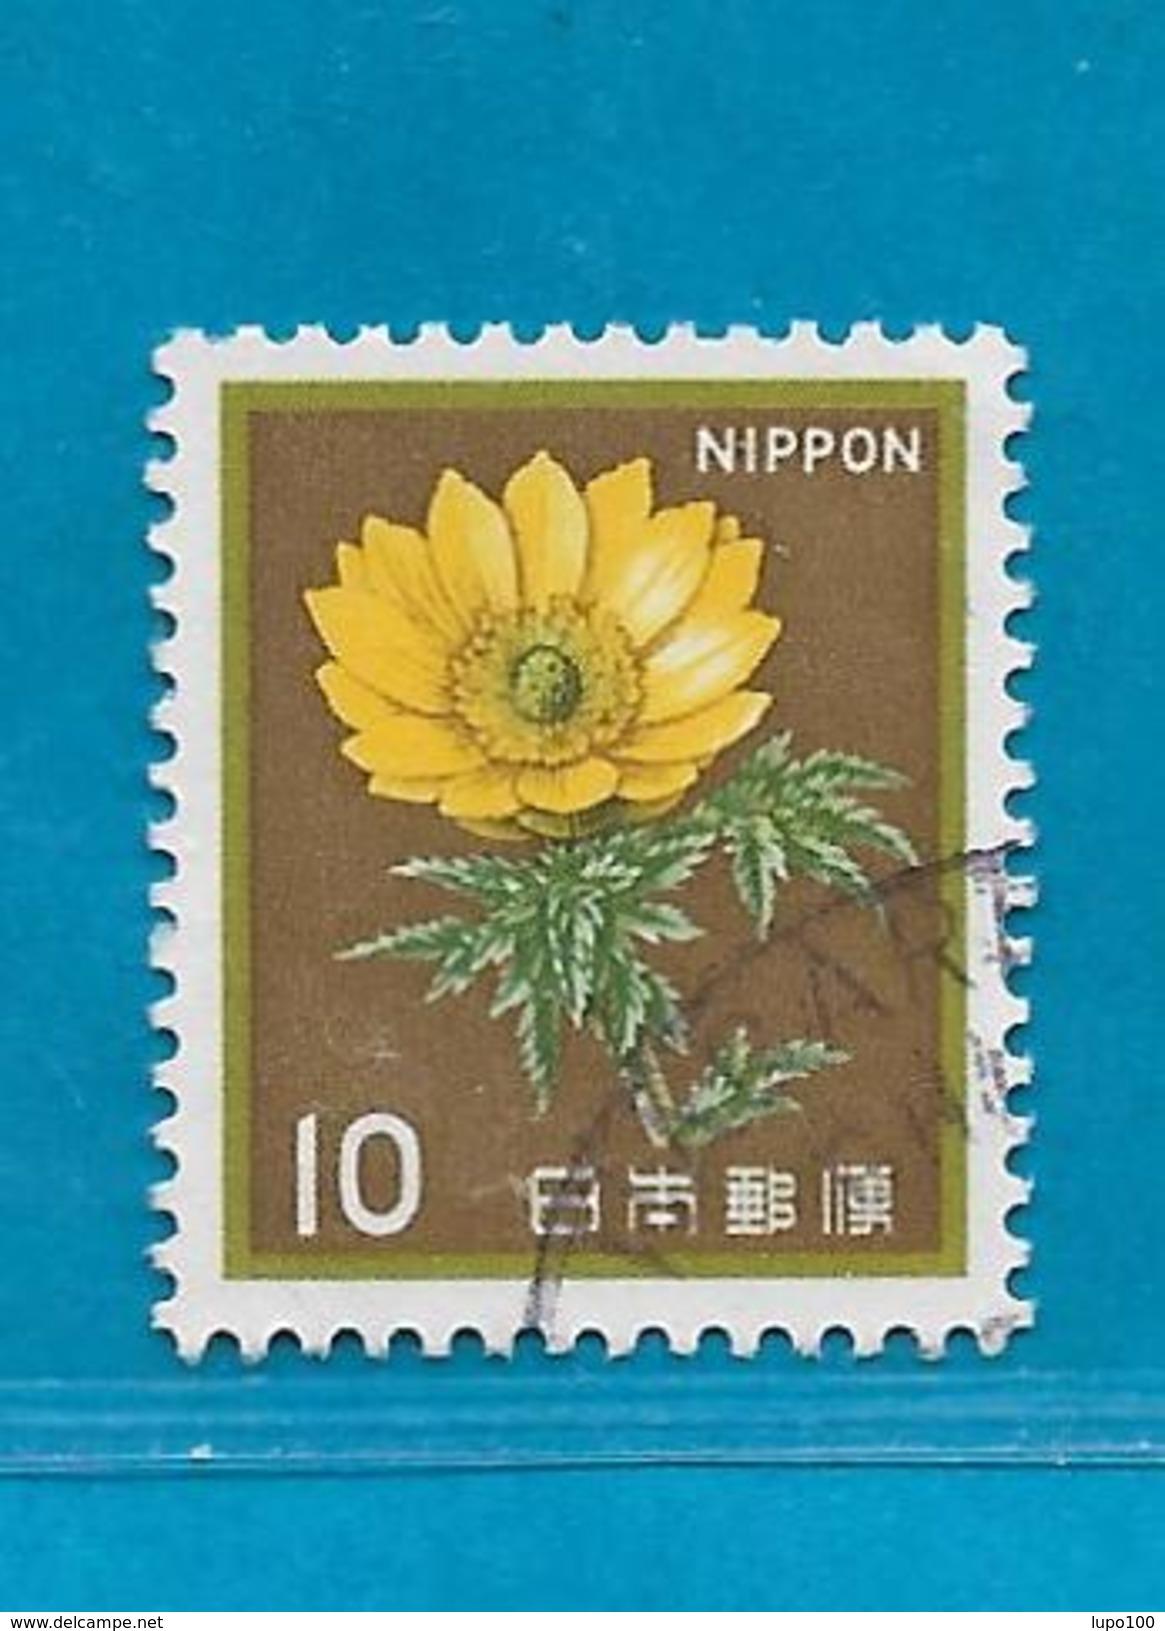 1982 GIAPPONE NIPPON FRANCOBOLLO USATO STAMP USED -  ORDINARIO FLORA FIORI 10 - Used Stamps